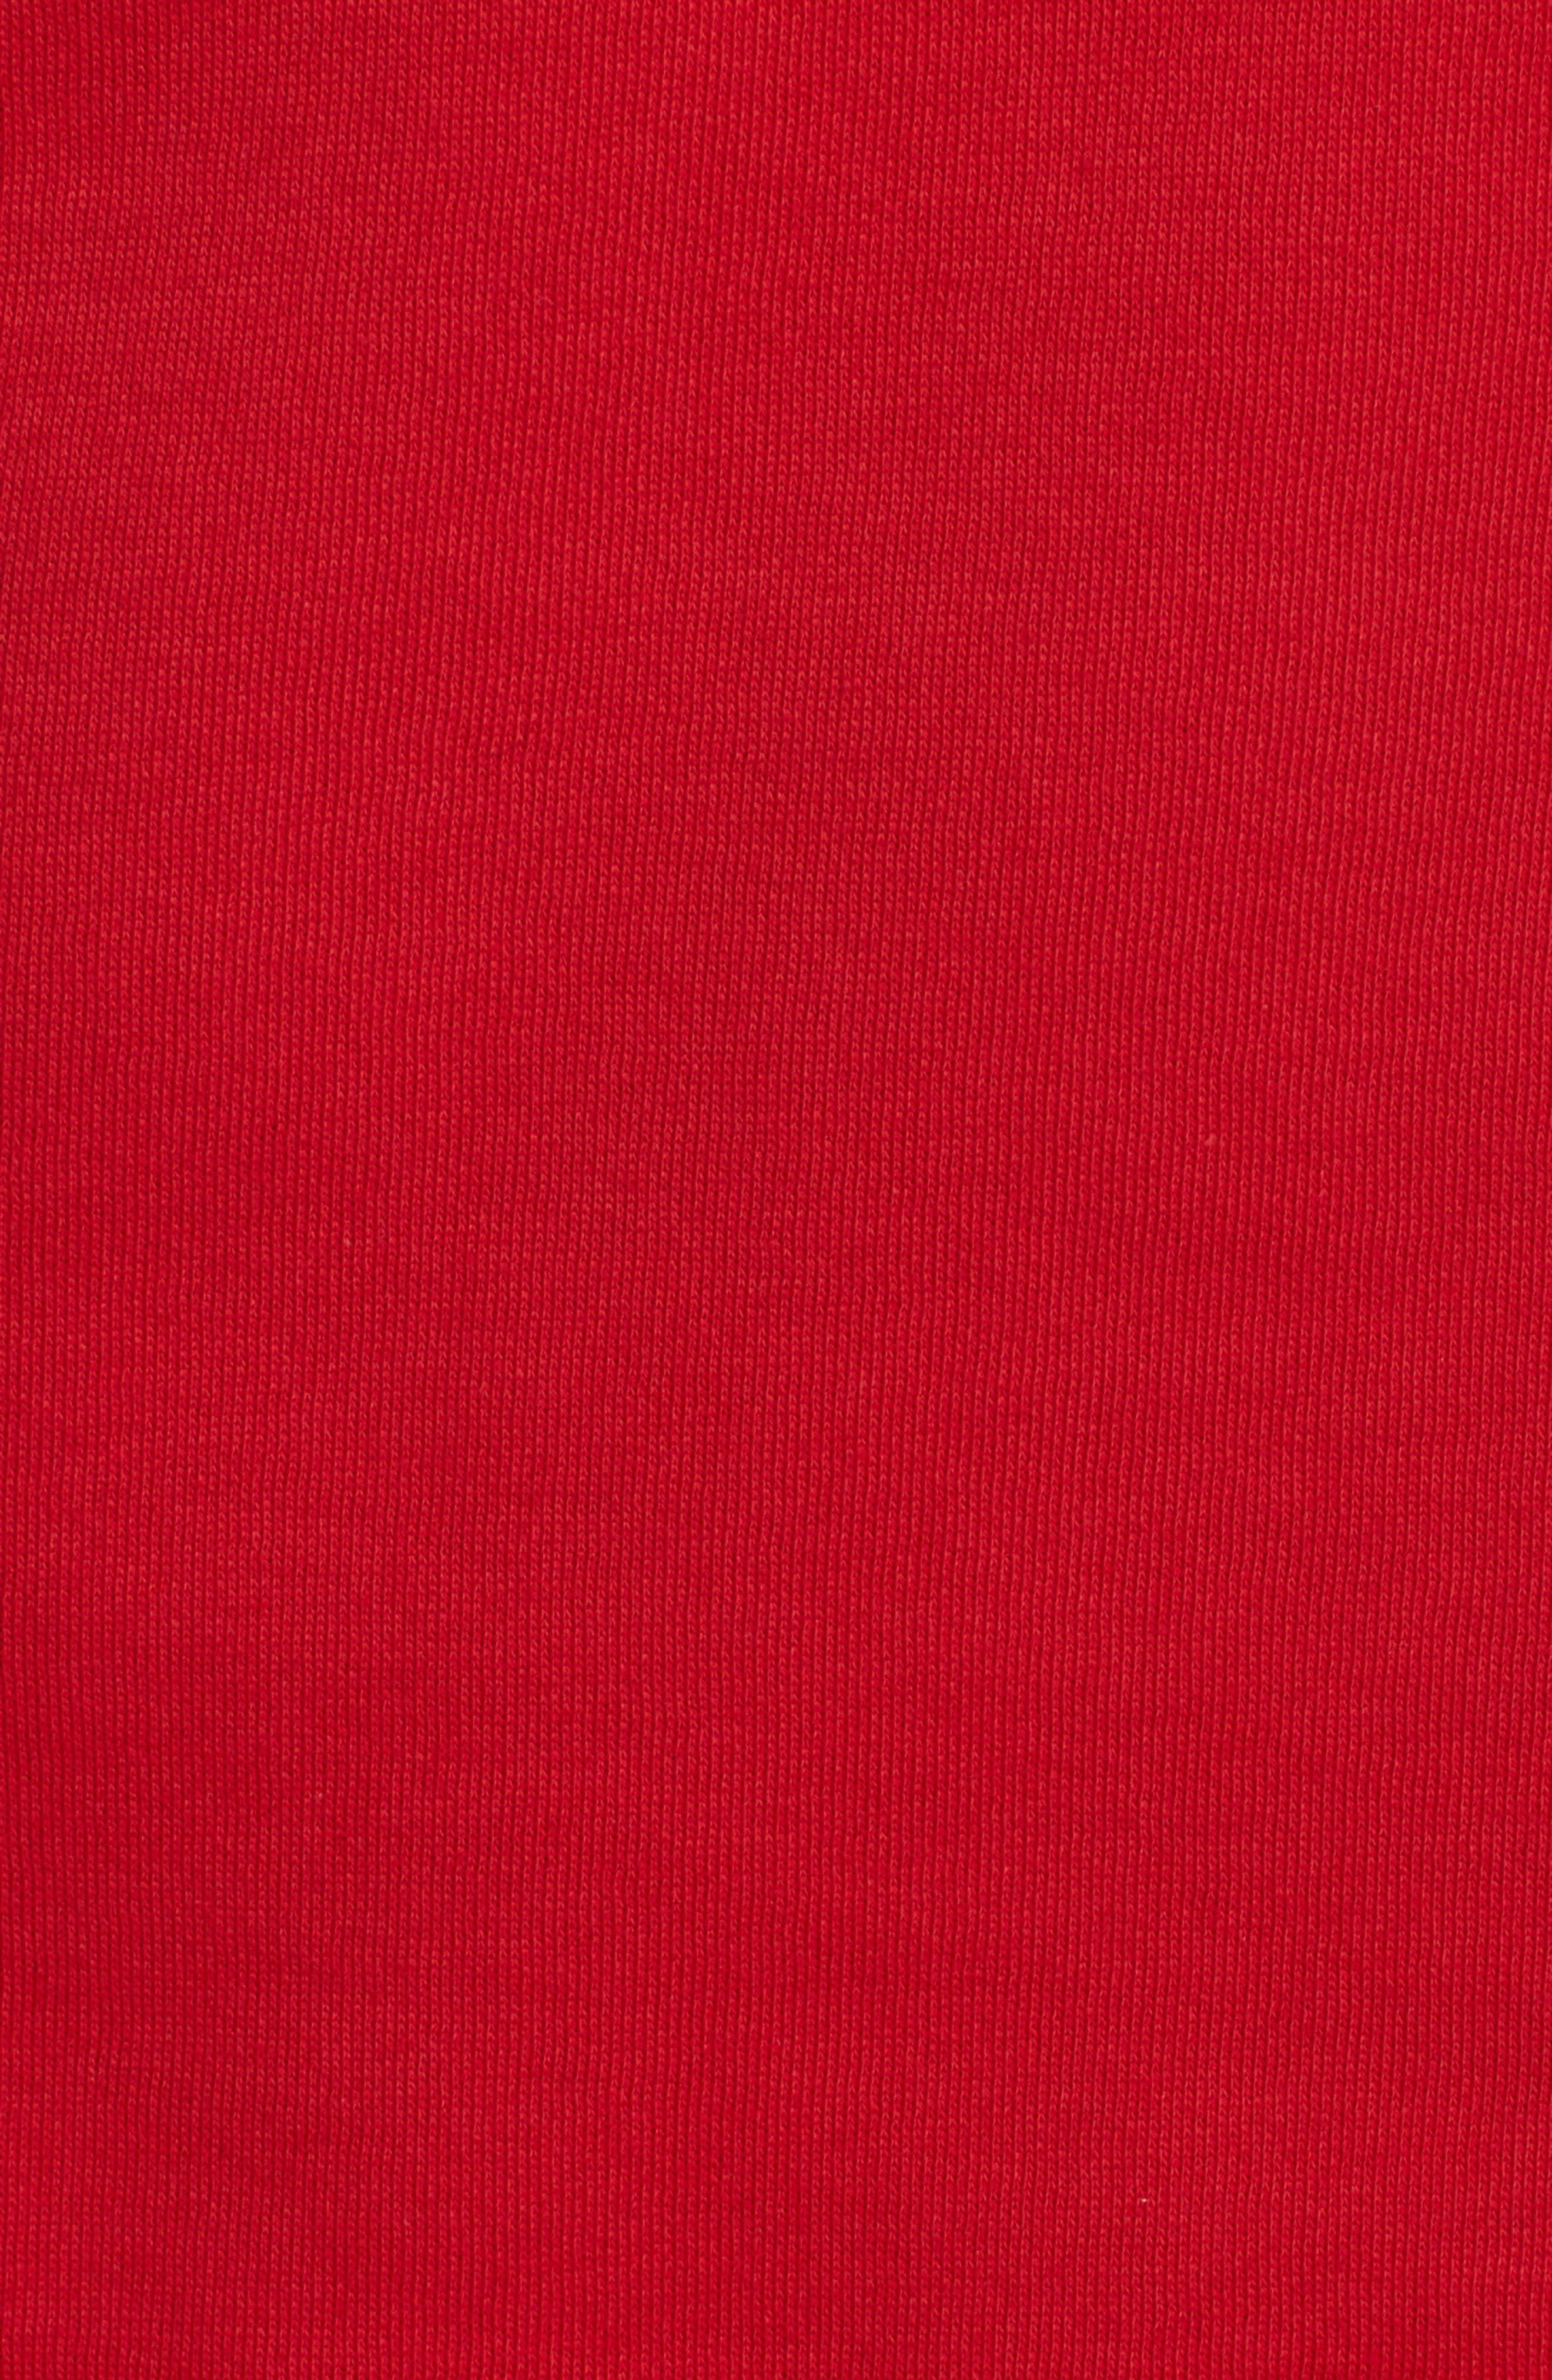 Logo Sweatshirt Tee,                             Alternate thumbnail 5, color,                             622